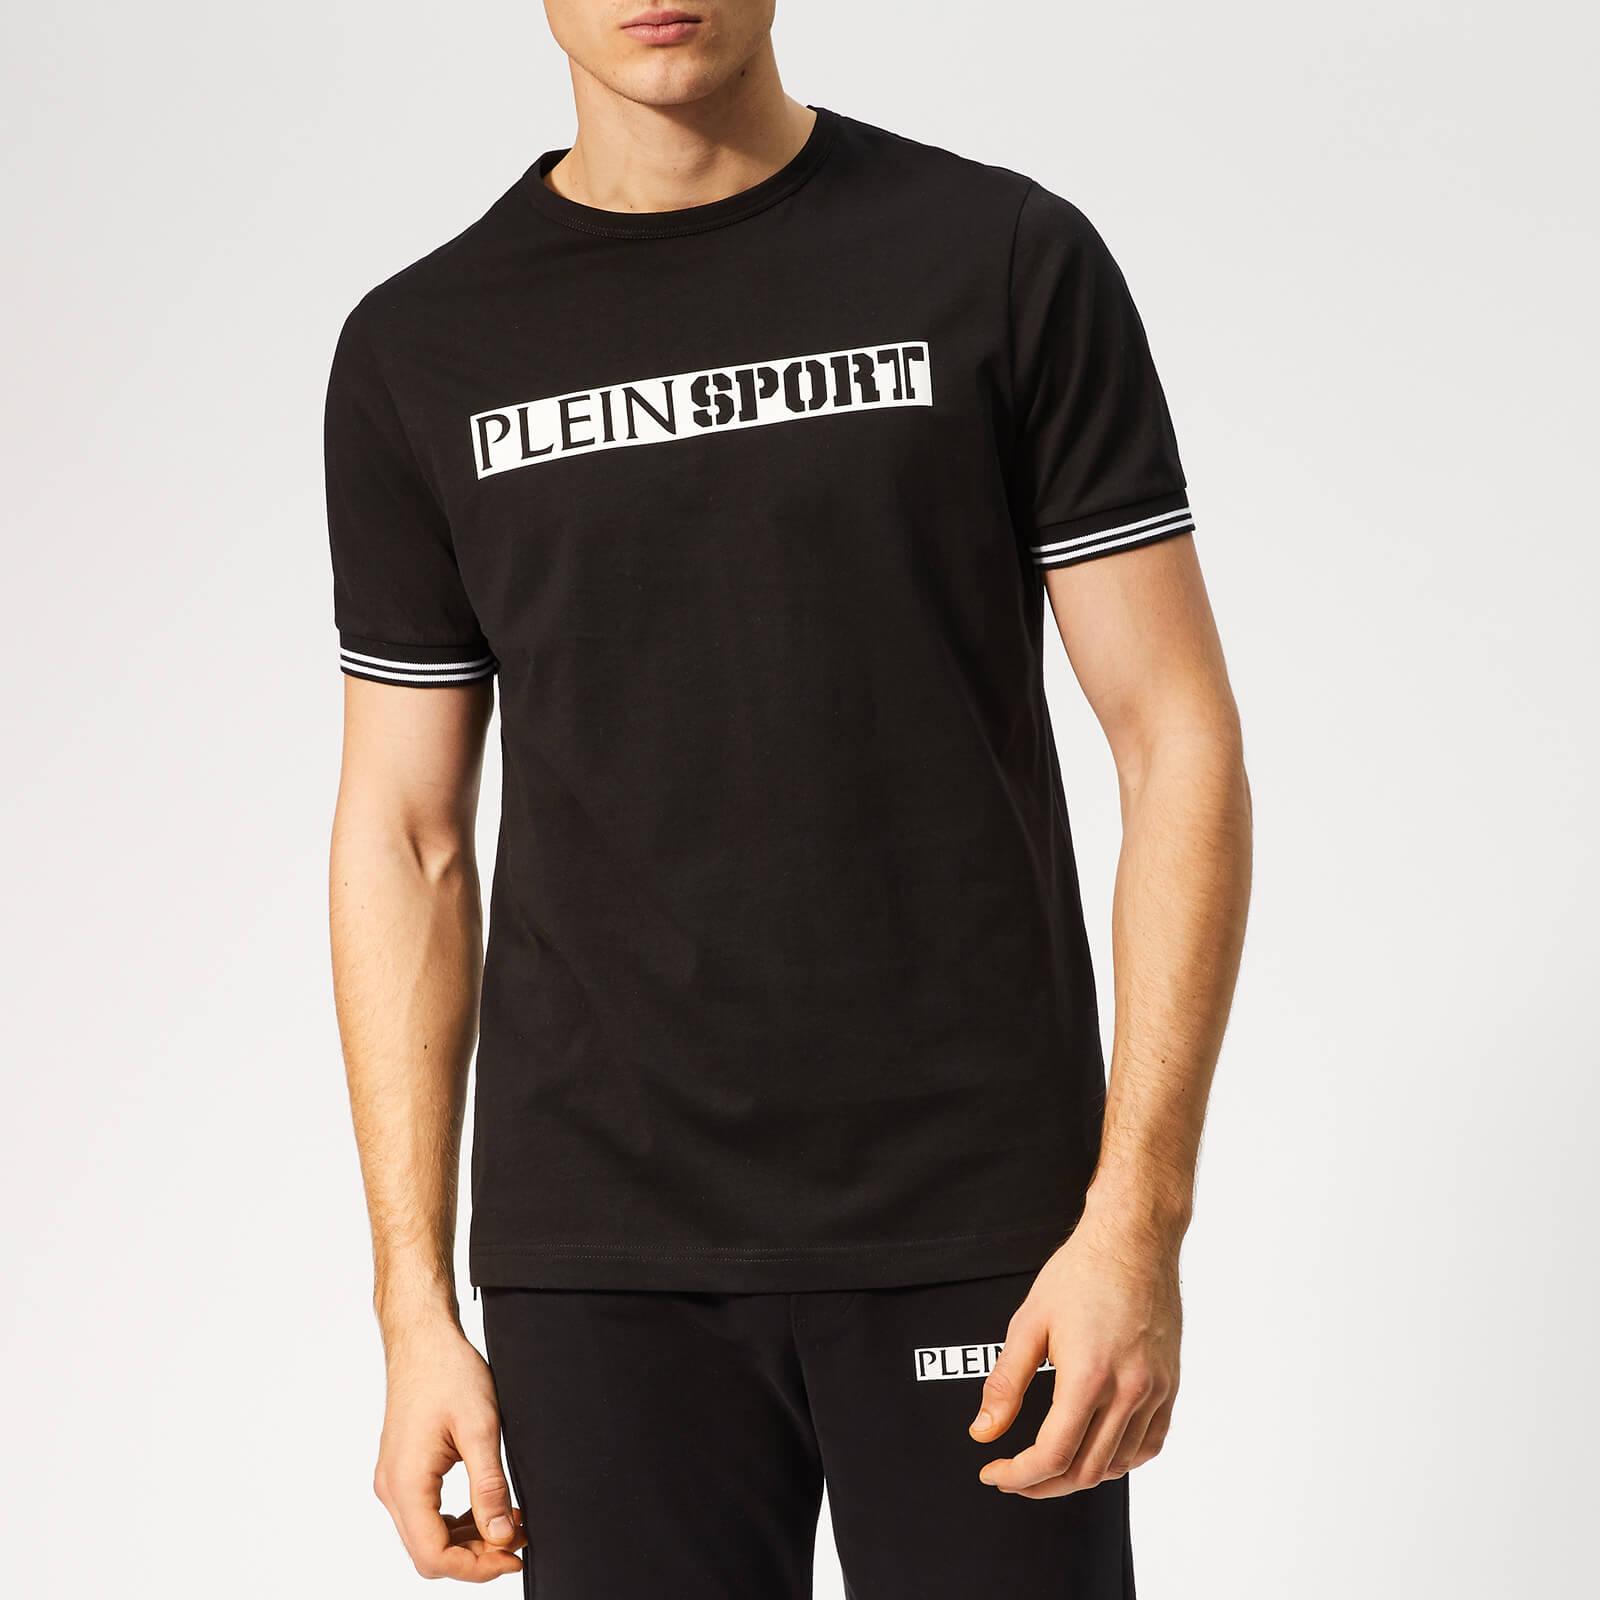 Plein Sport Men's Statement T-Shirt - Black/Black - M - Black/Black